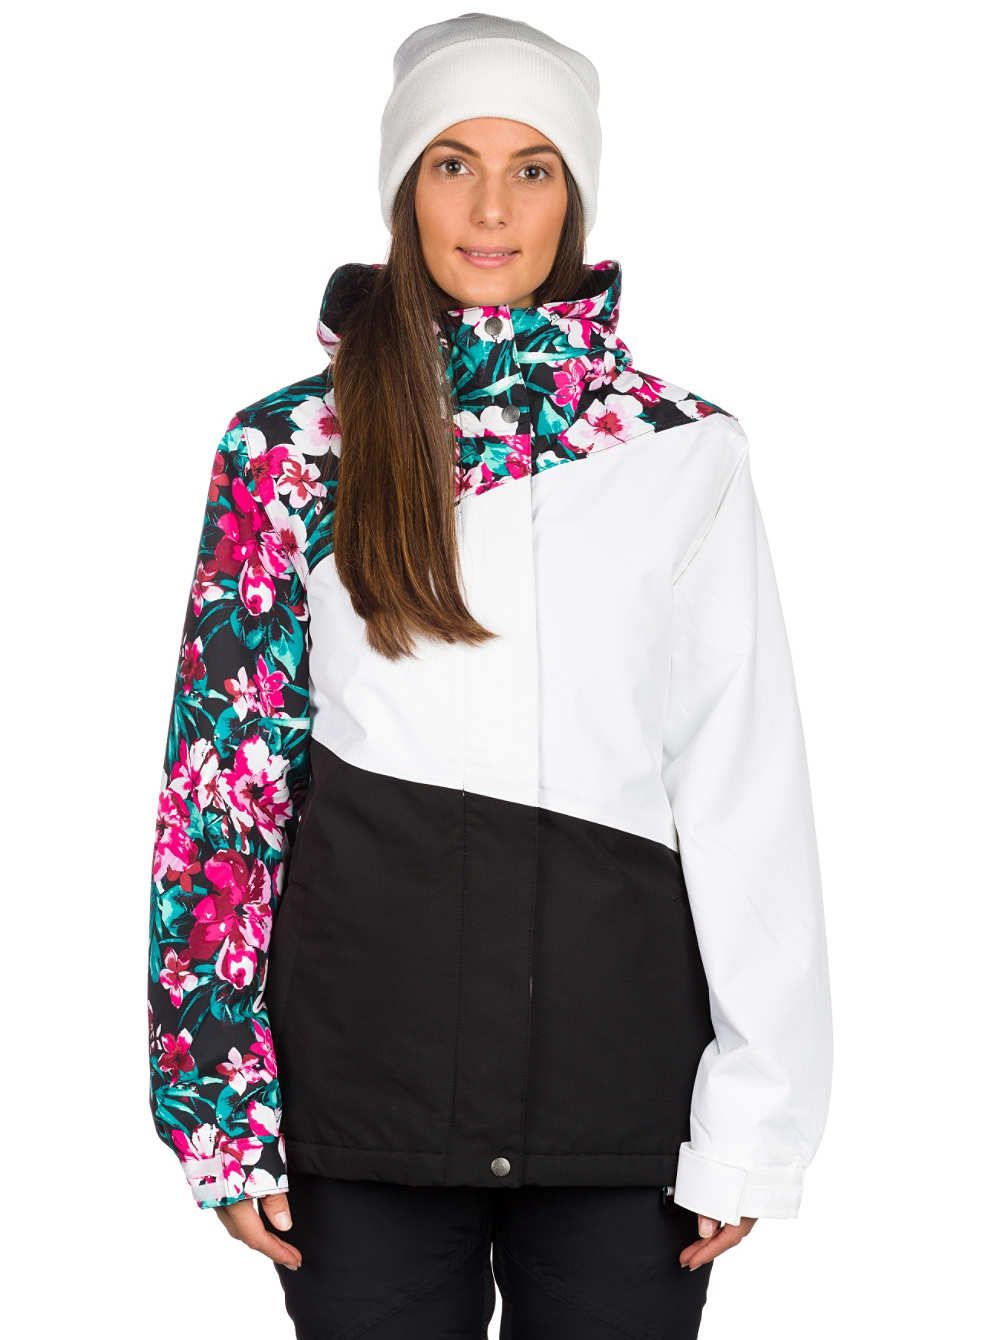 Aperture Girls Pan Face Jacket online kaufen bei blue-tomato.com